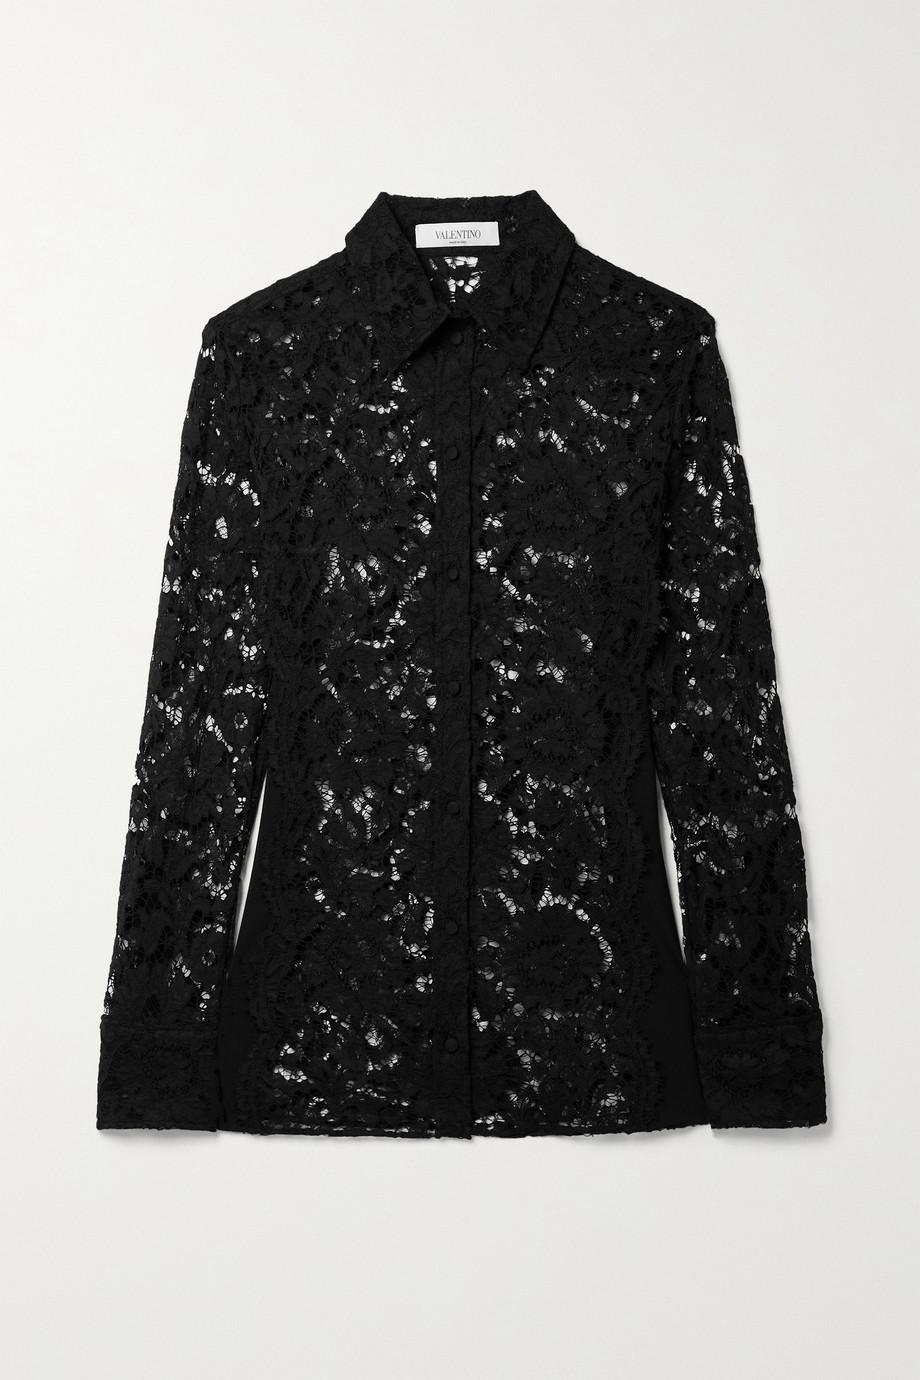 Valentino Chemise en dentelle cordonnet et en jersey